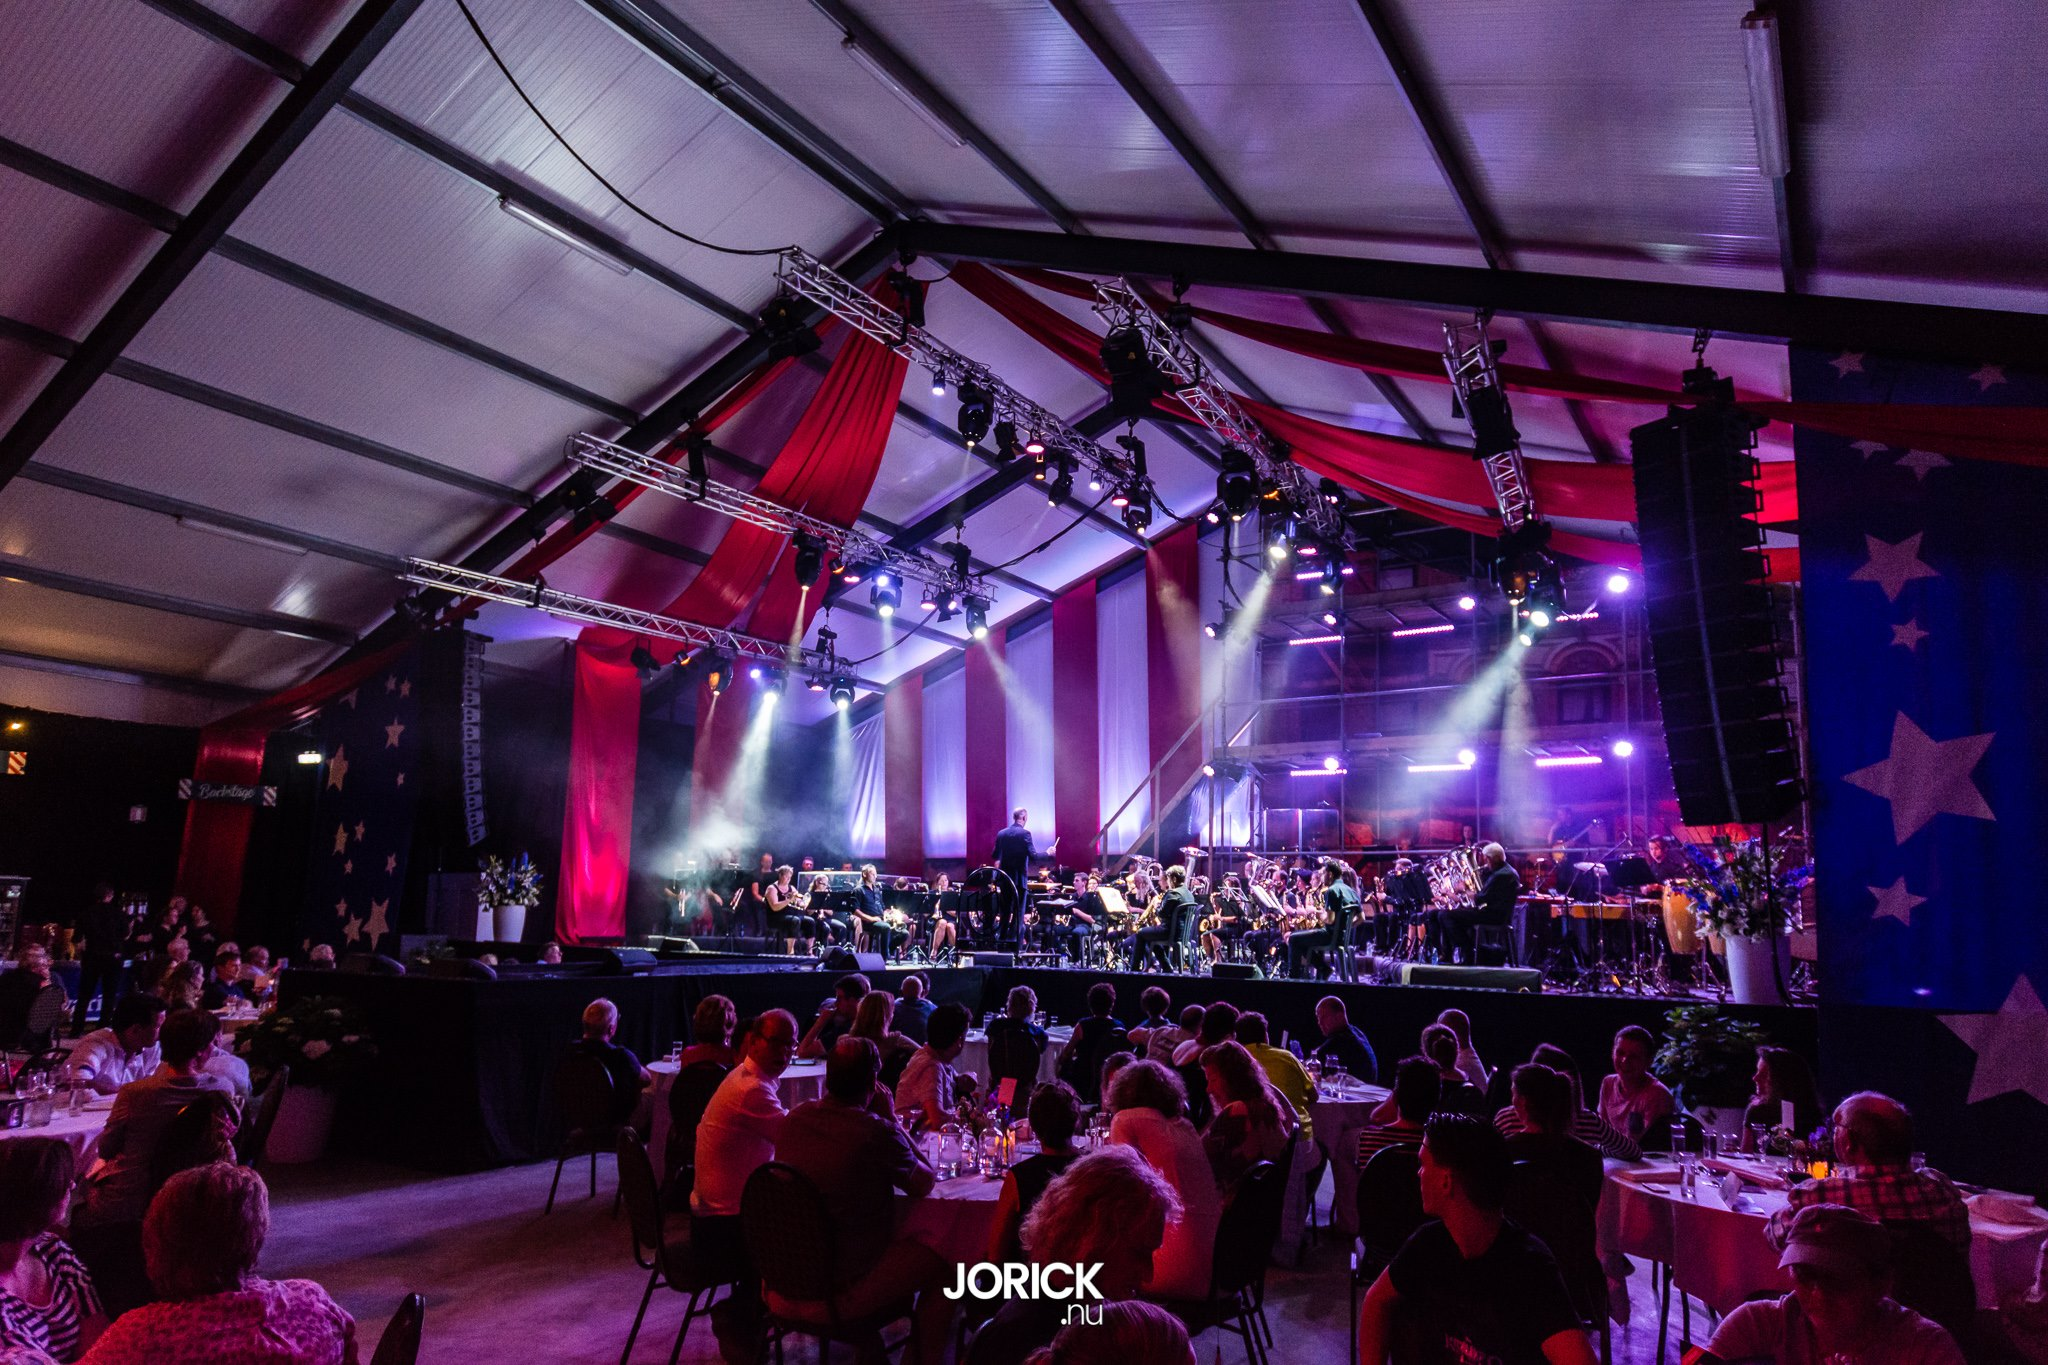 20170602 Stars Delight Dinnershow - Jorick de Kruif (11)